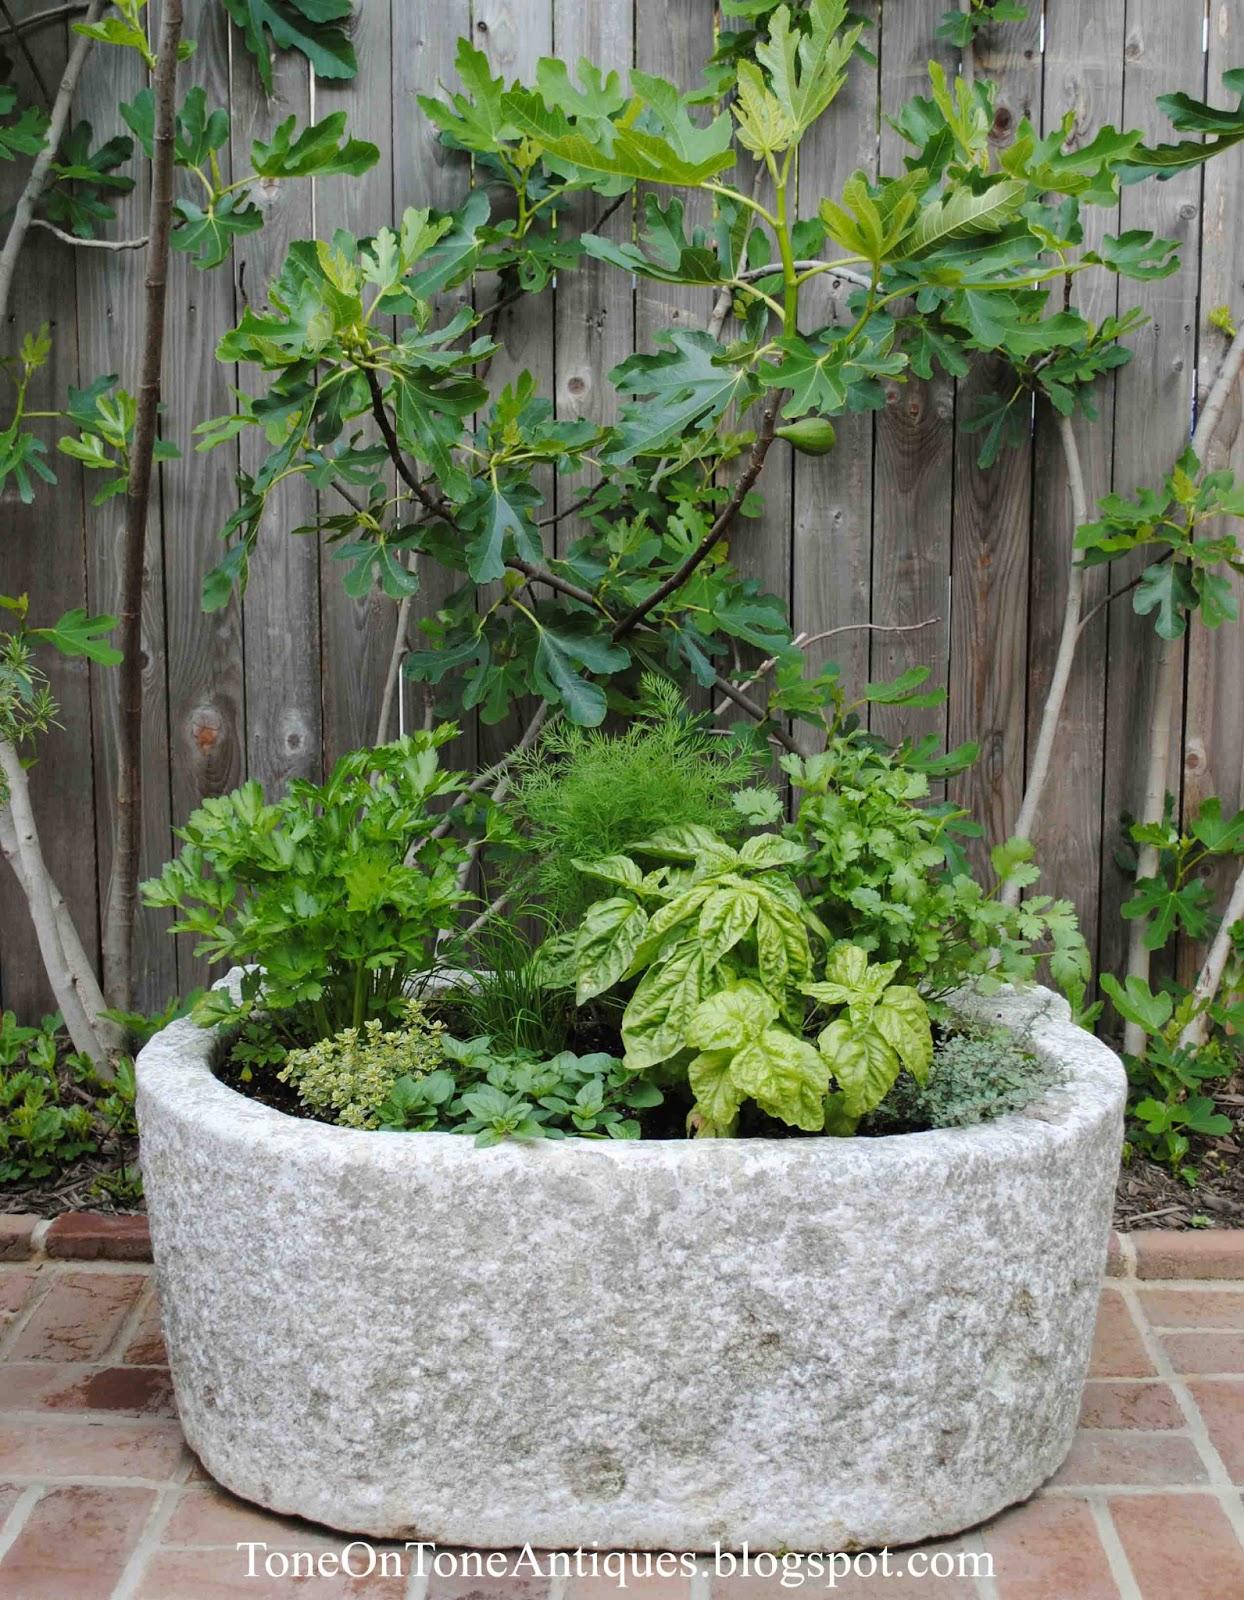 Tone On Tone A Trough Herb Planter